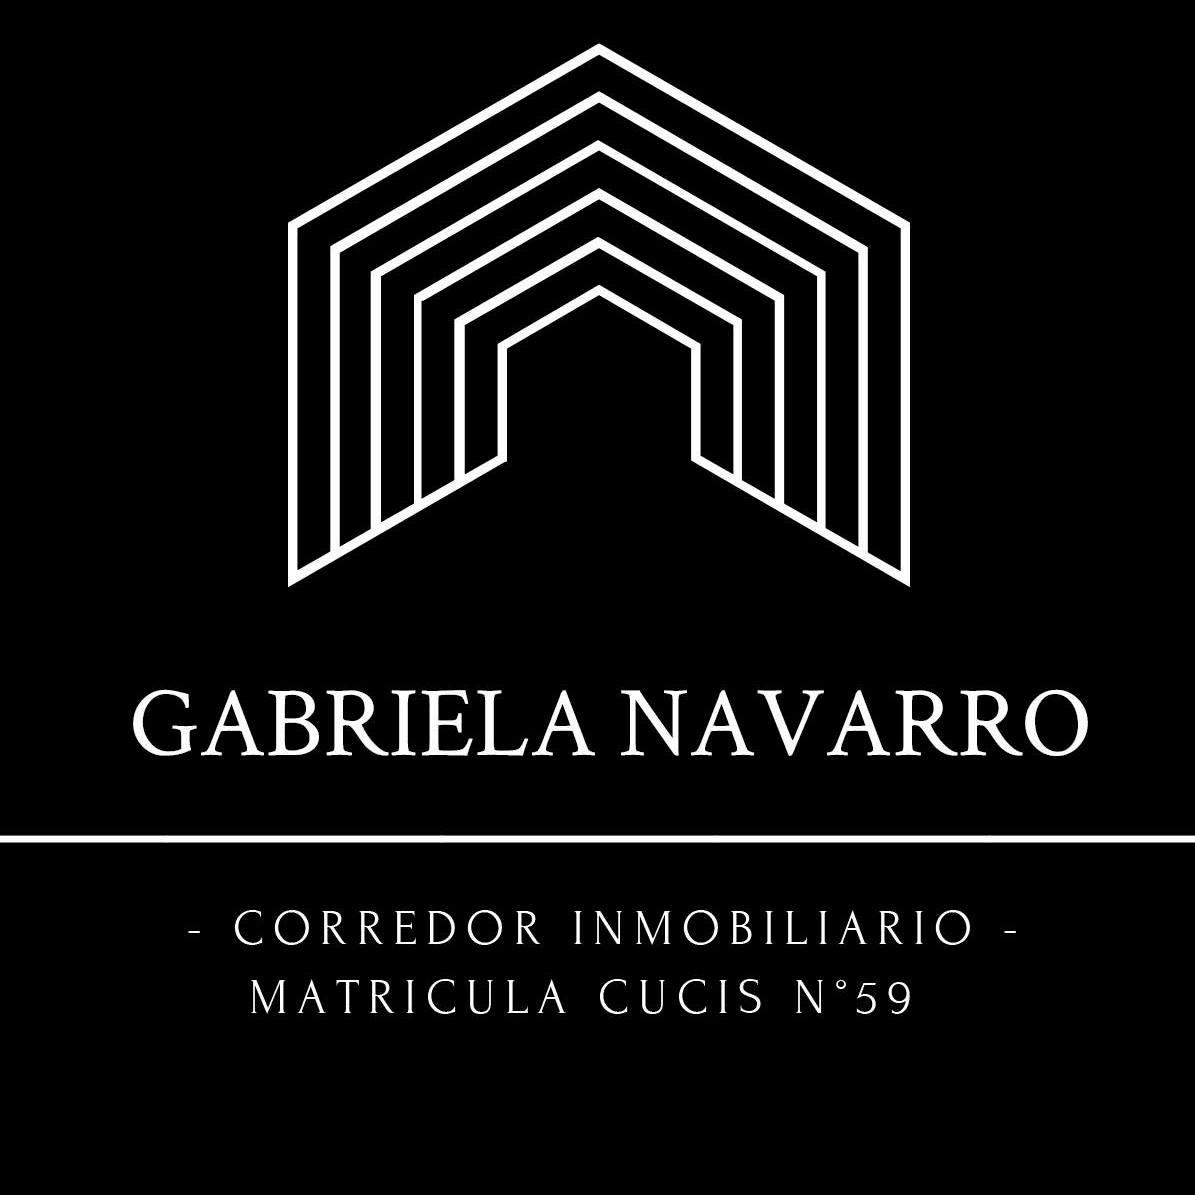 Gabriela Navarro